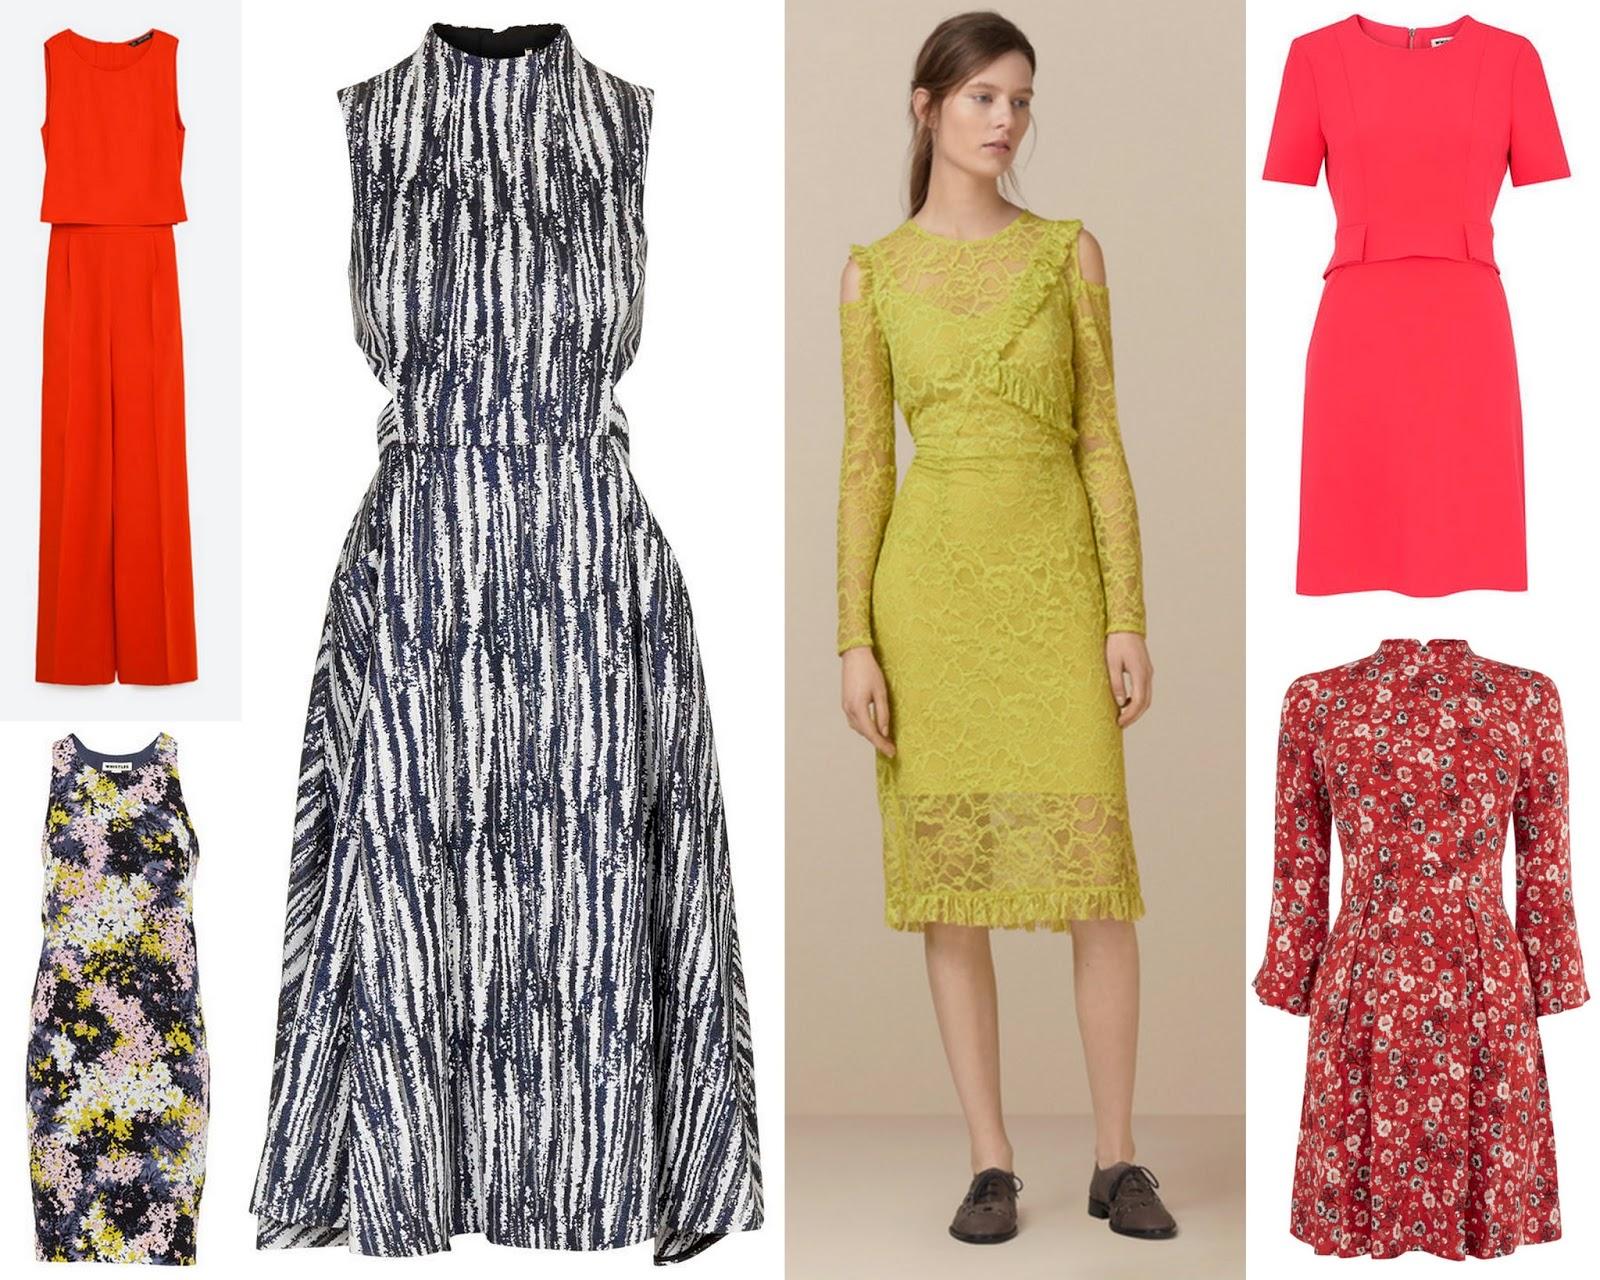 spring wedding guest dresses - Wedding Decor Ideas